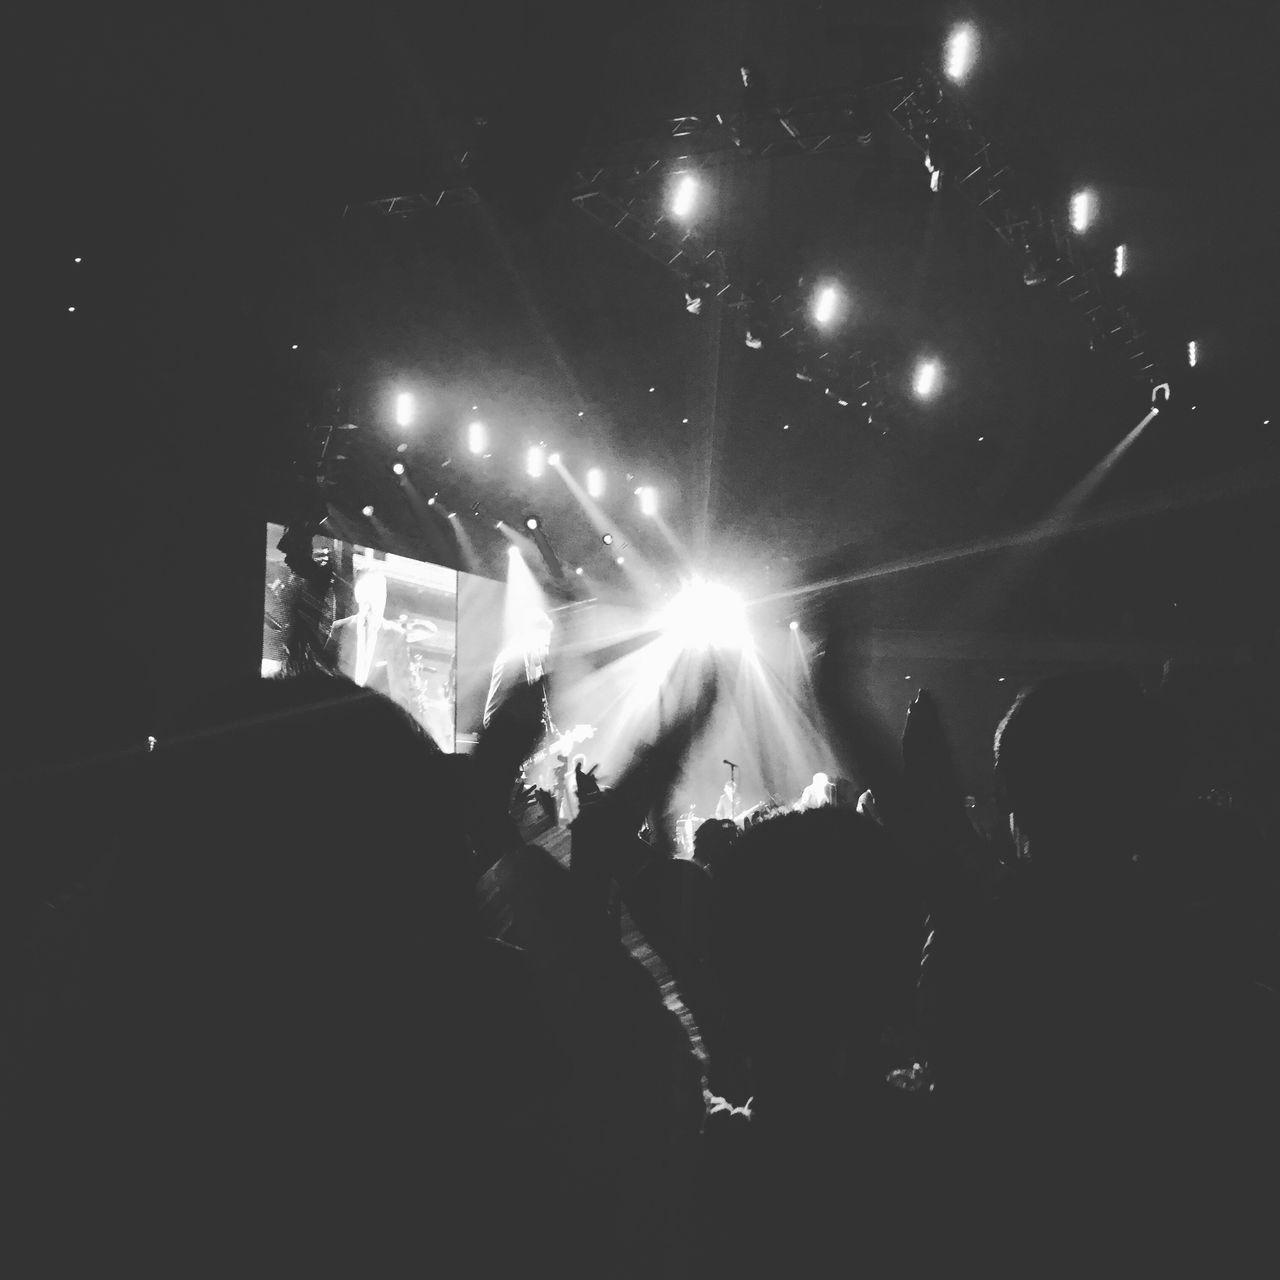 Live Music Music Spotlight Applose Handclap Feaver Budokan Rocknroll Stage Liveperformance Bryanadams Tokyo,Japan Monochrome Monochrome Photography